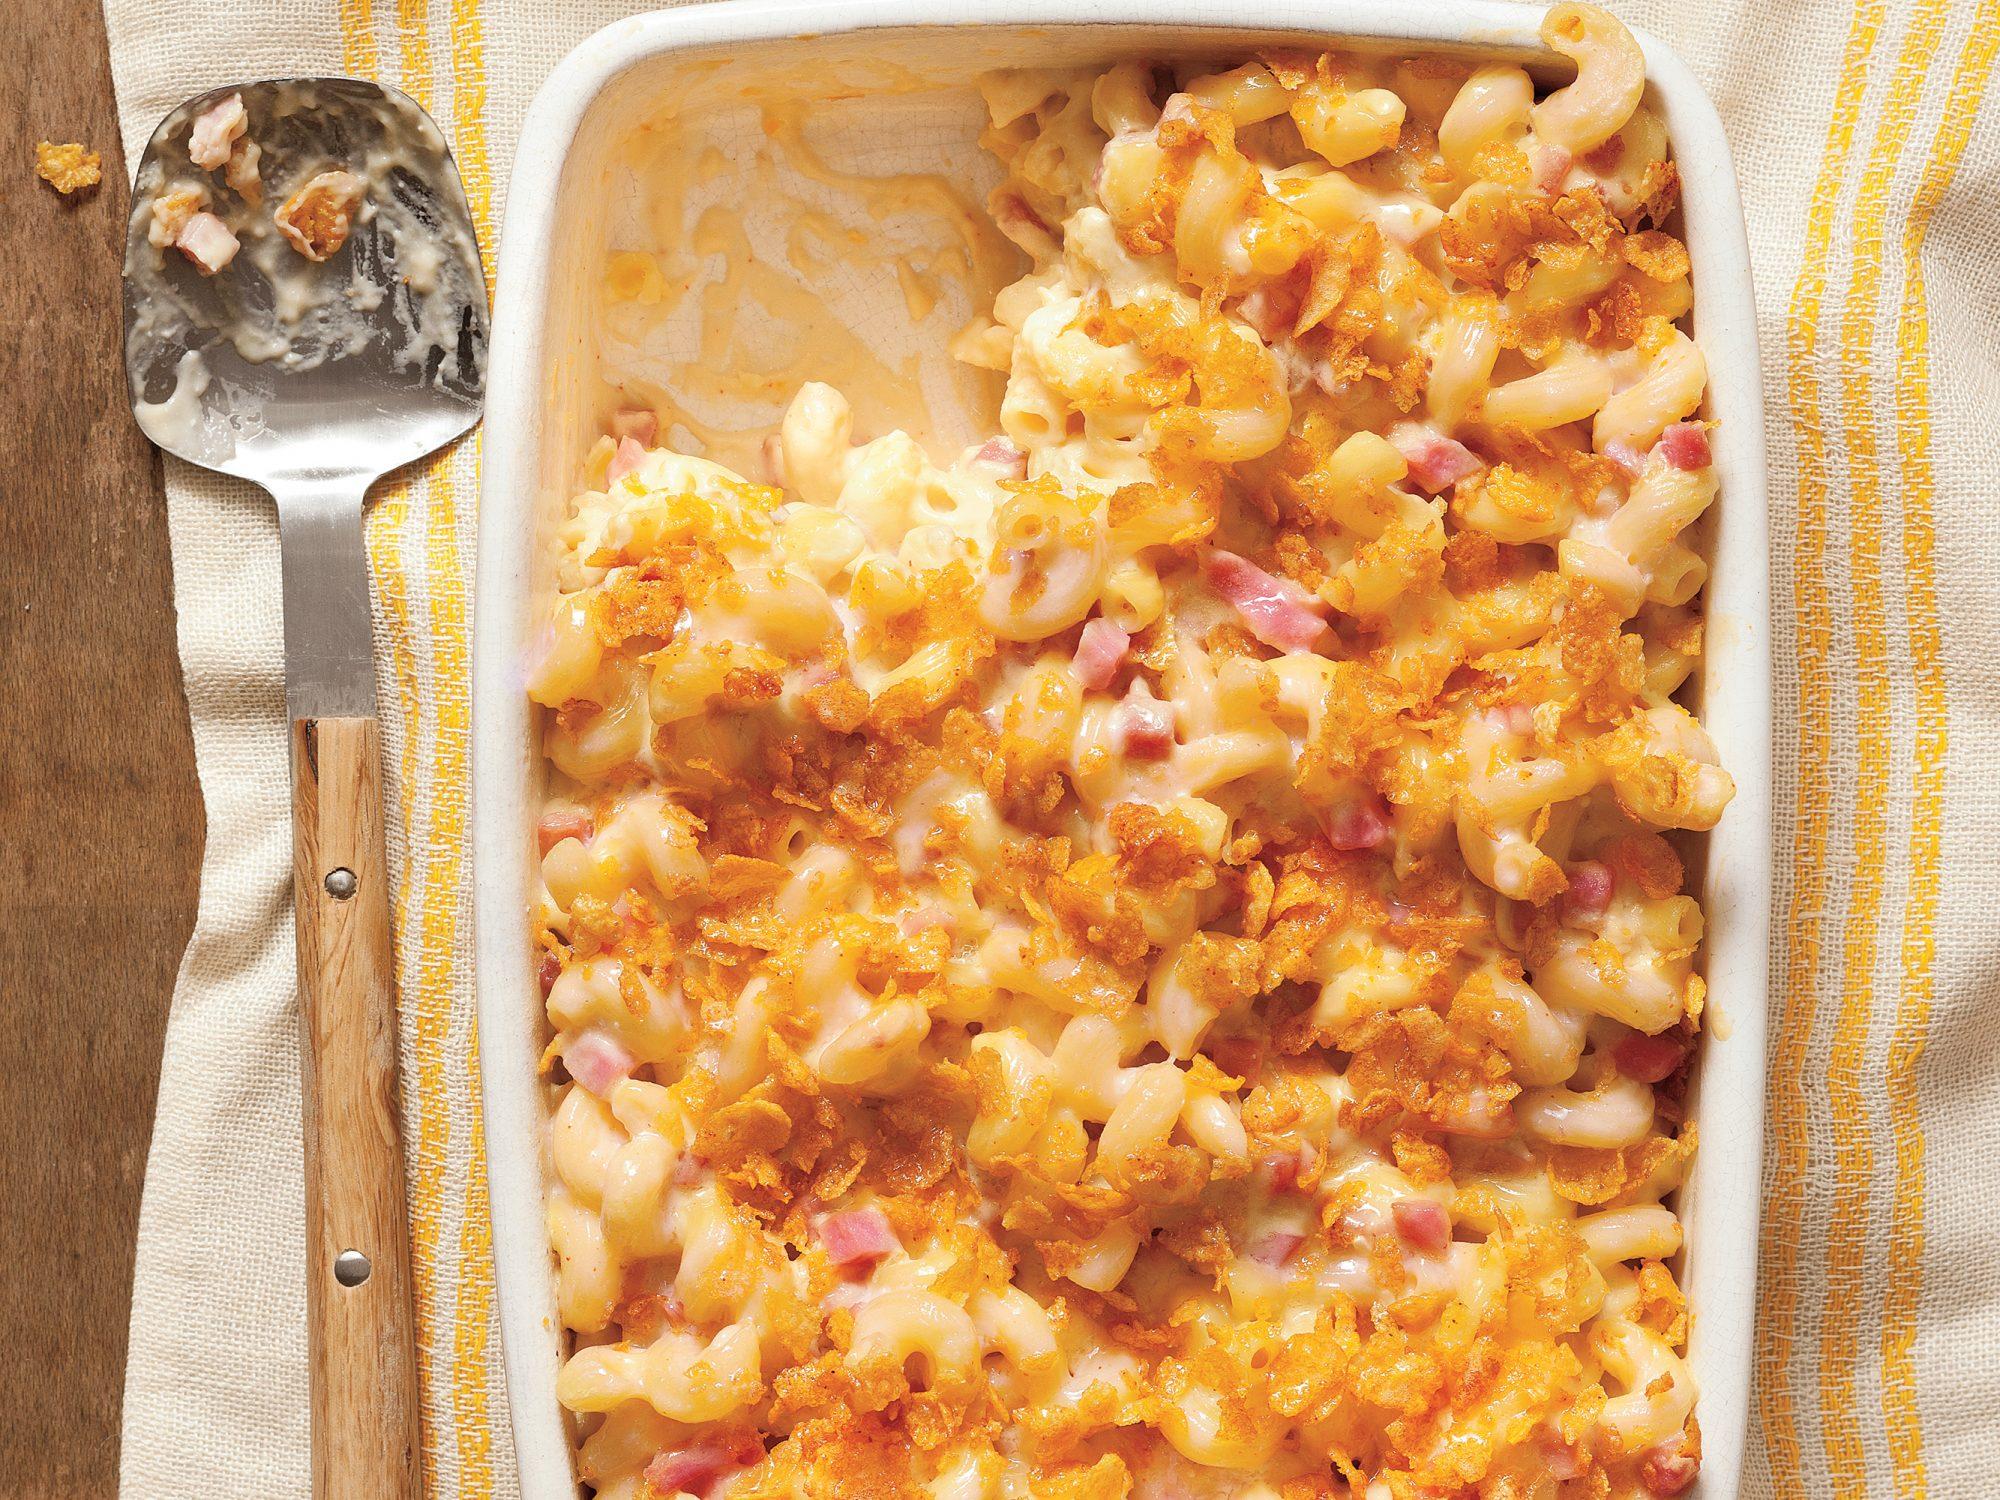 smokin-macaroni-cheese-sl-crop.jpg